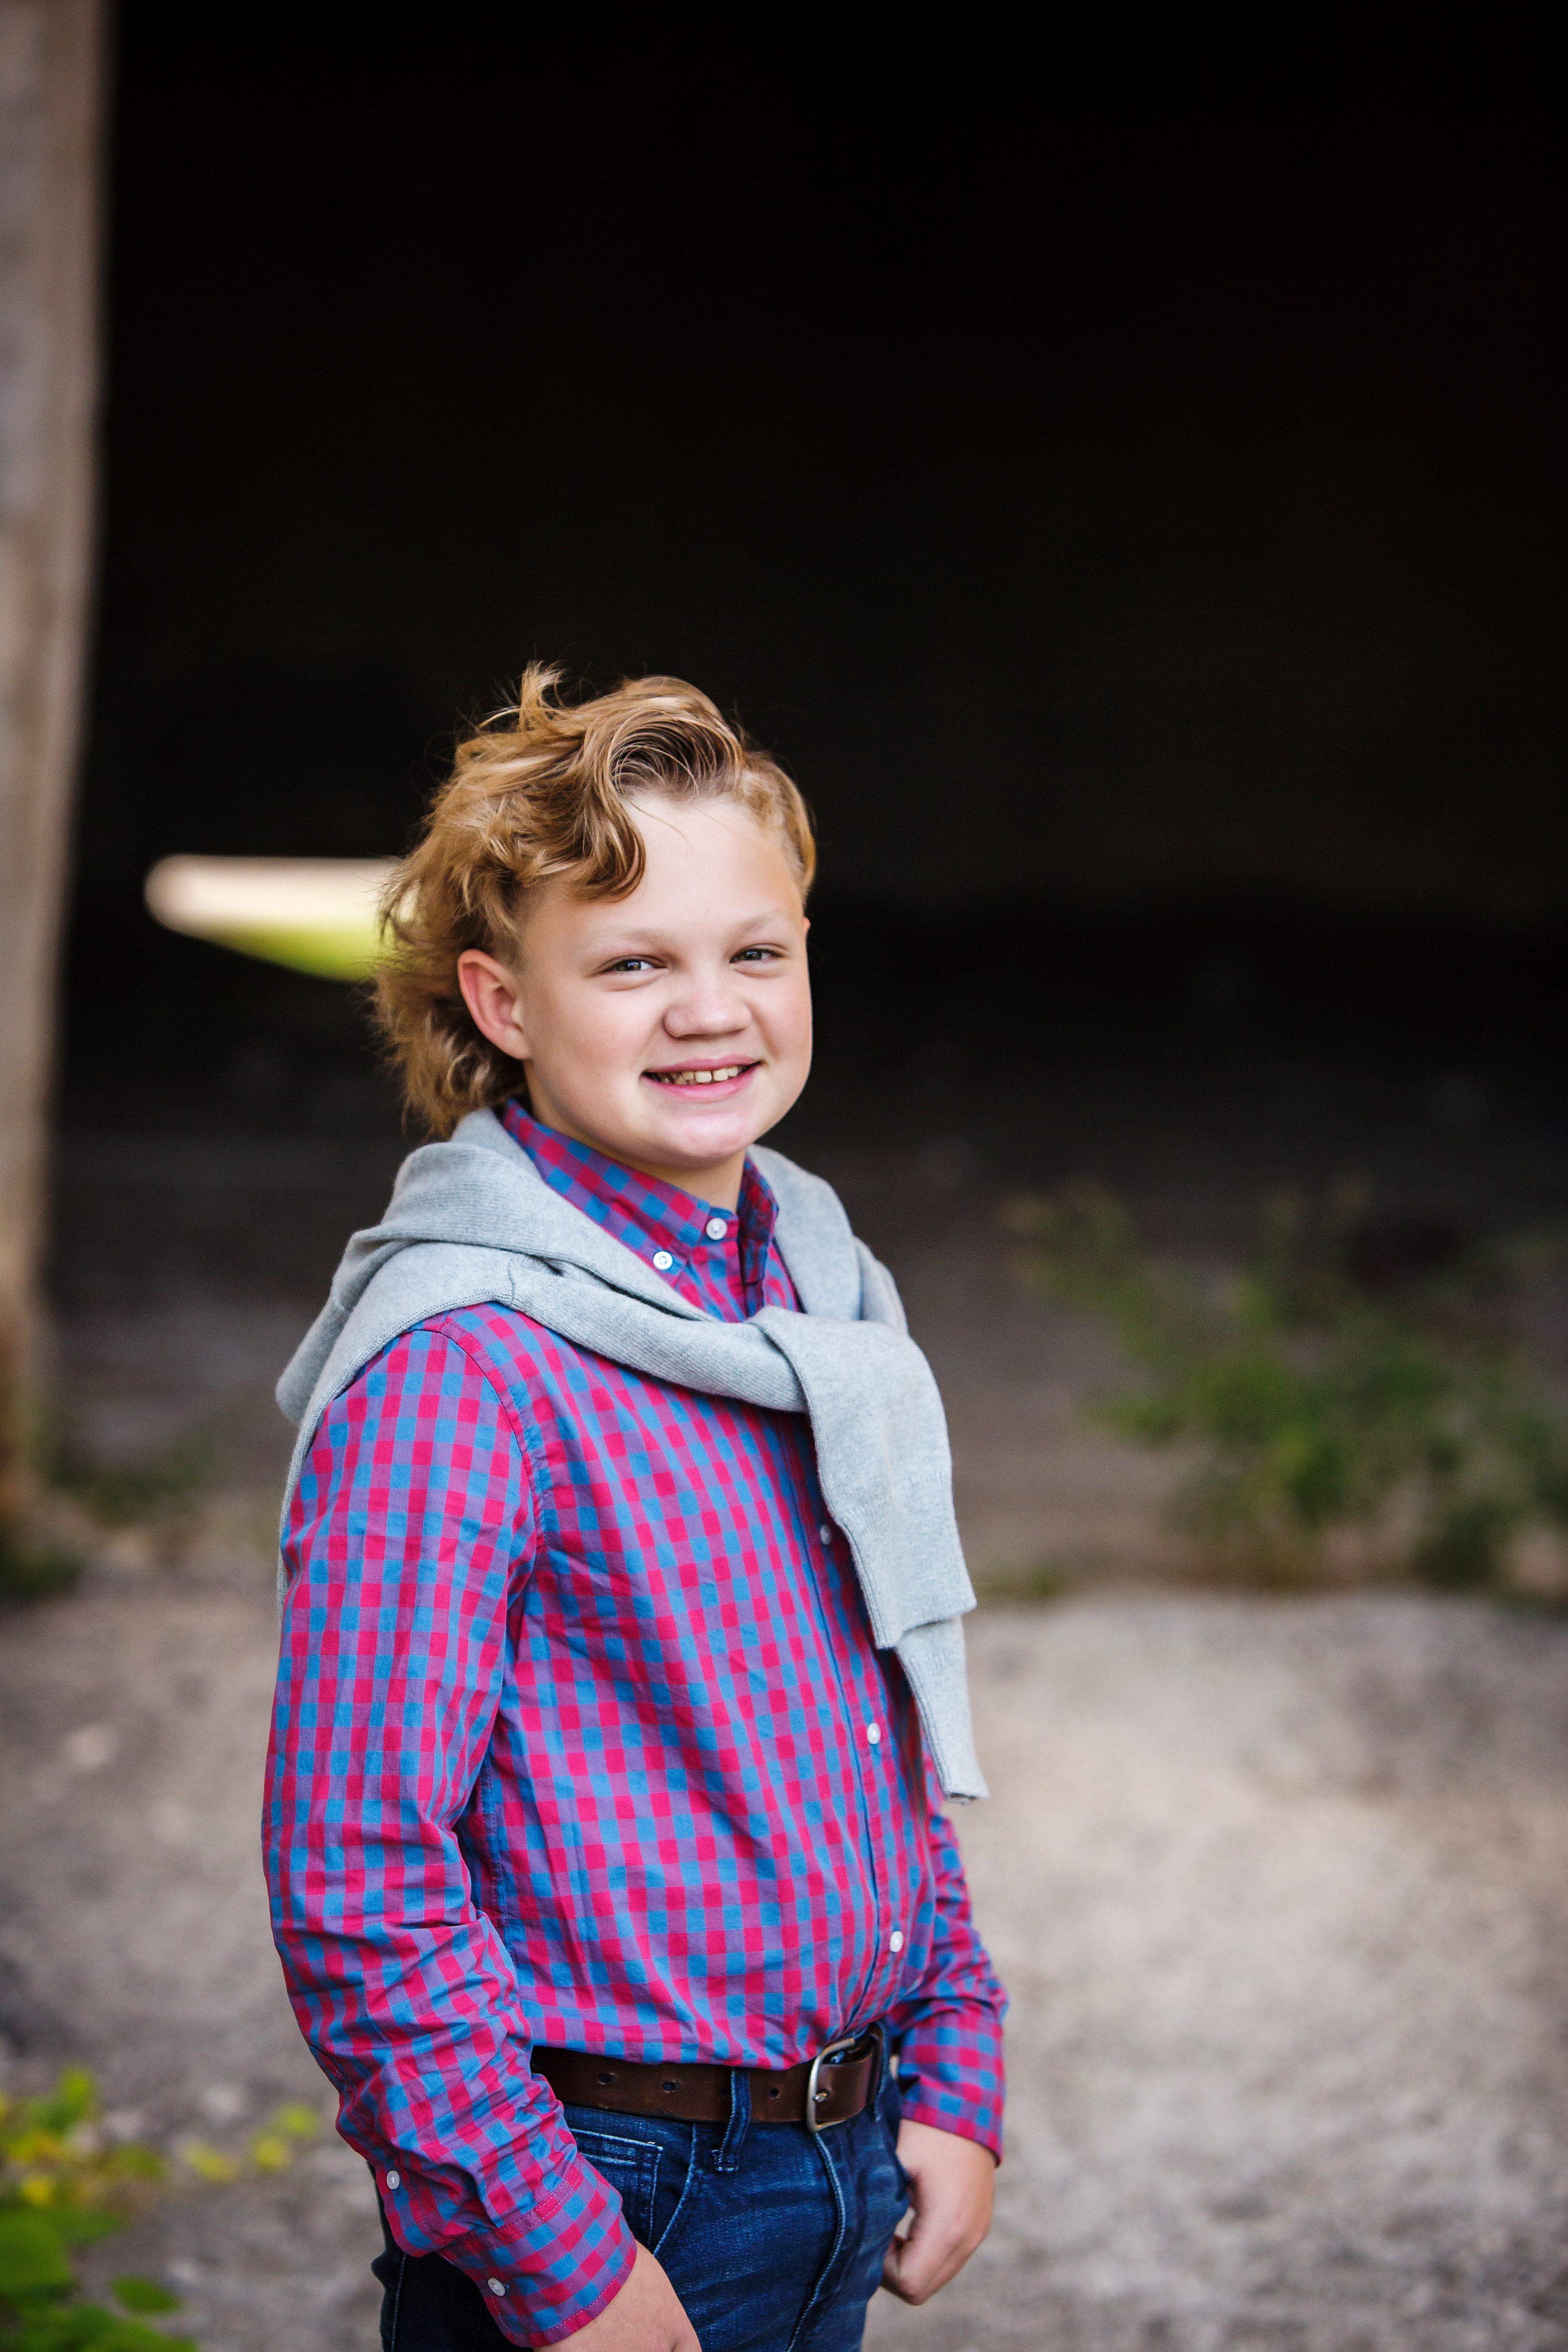 Childrens Photography,Melissa Rieke Photography